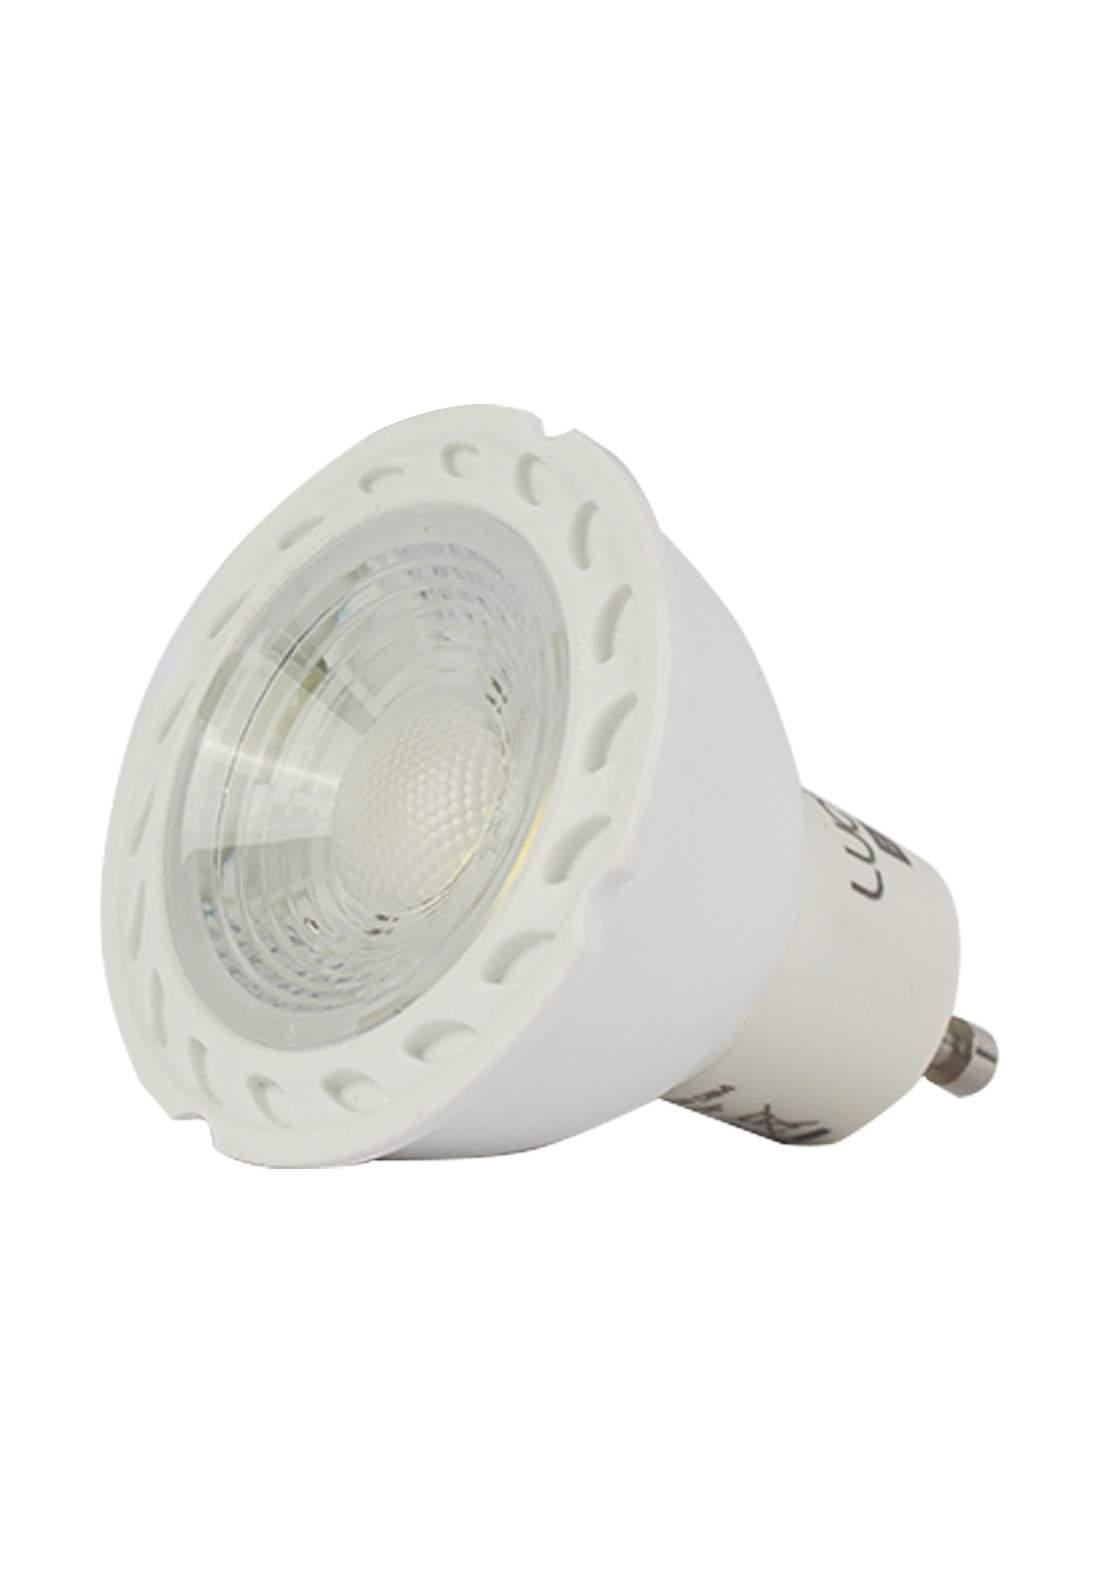 Bg GU10 Luceco LED 7W  مصباح ليد